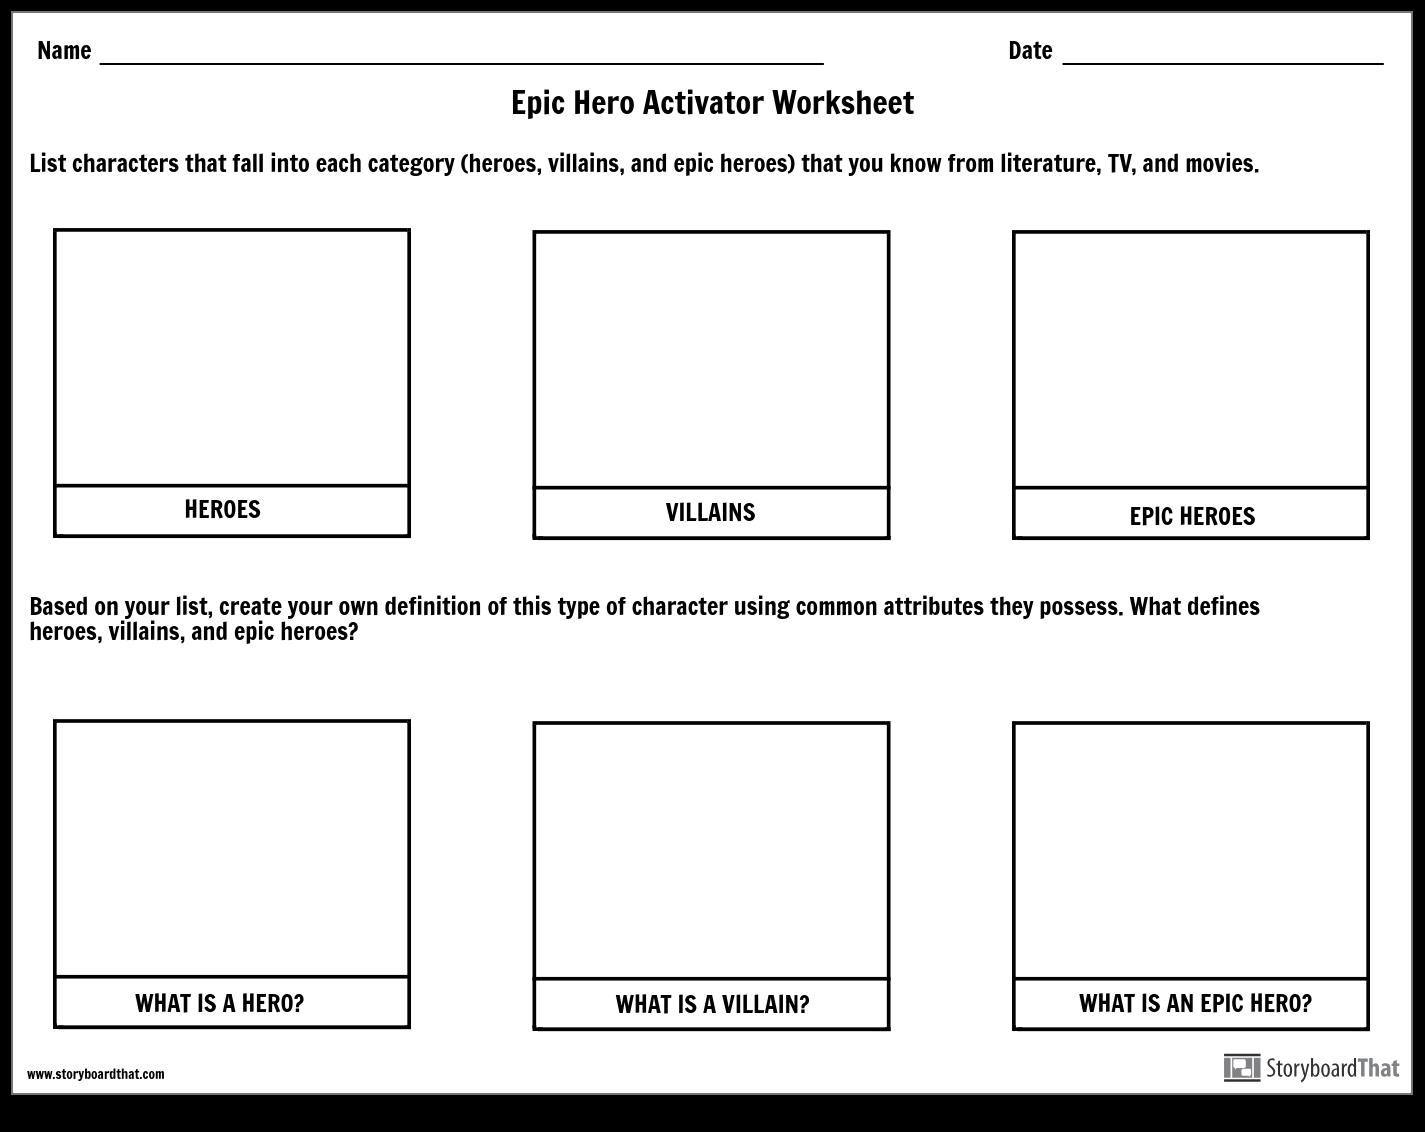 Epic Hero Activator Worksheet Storyboard by emily 💕